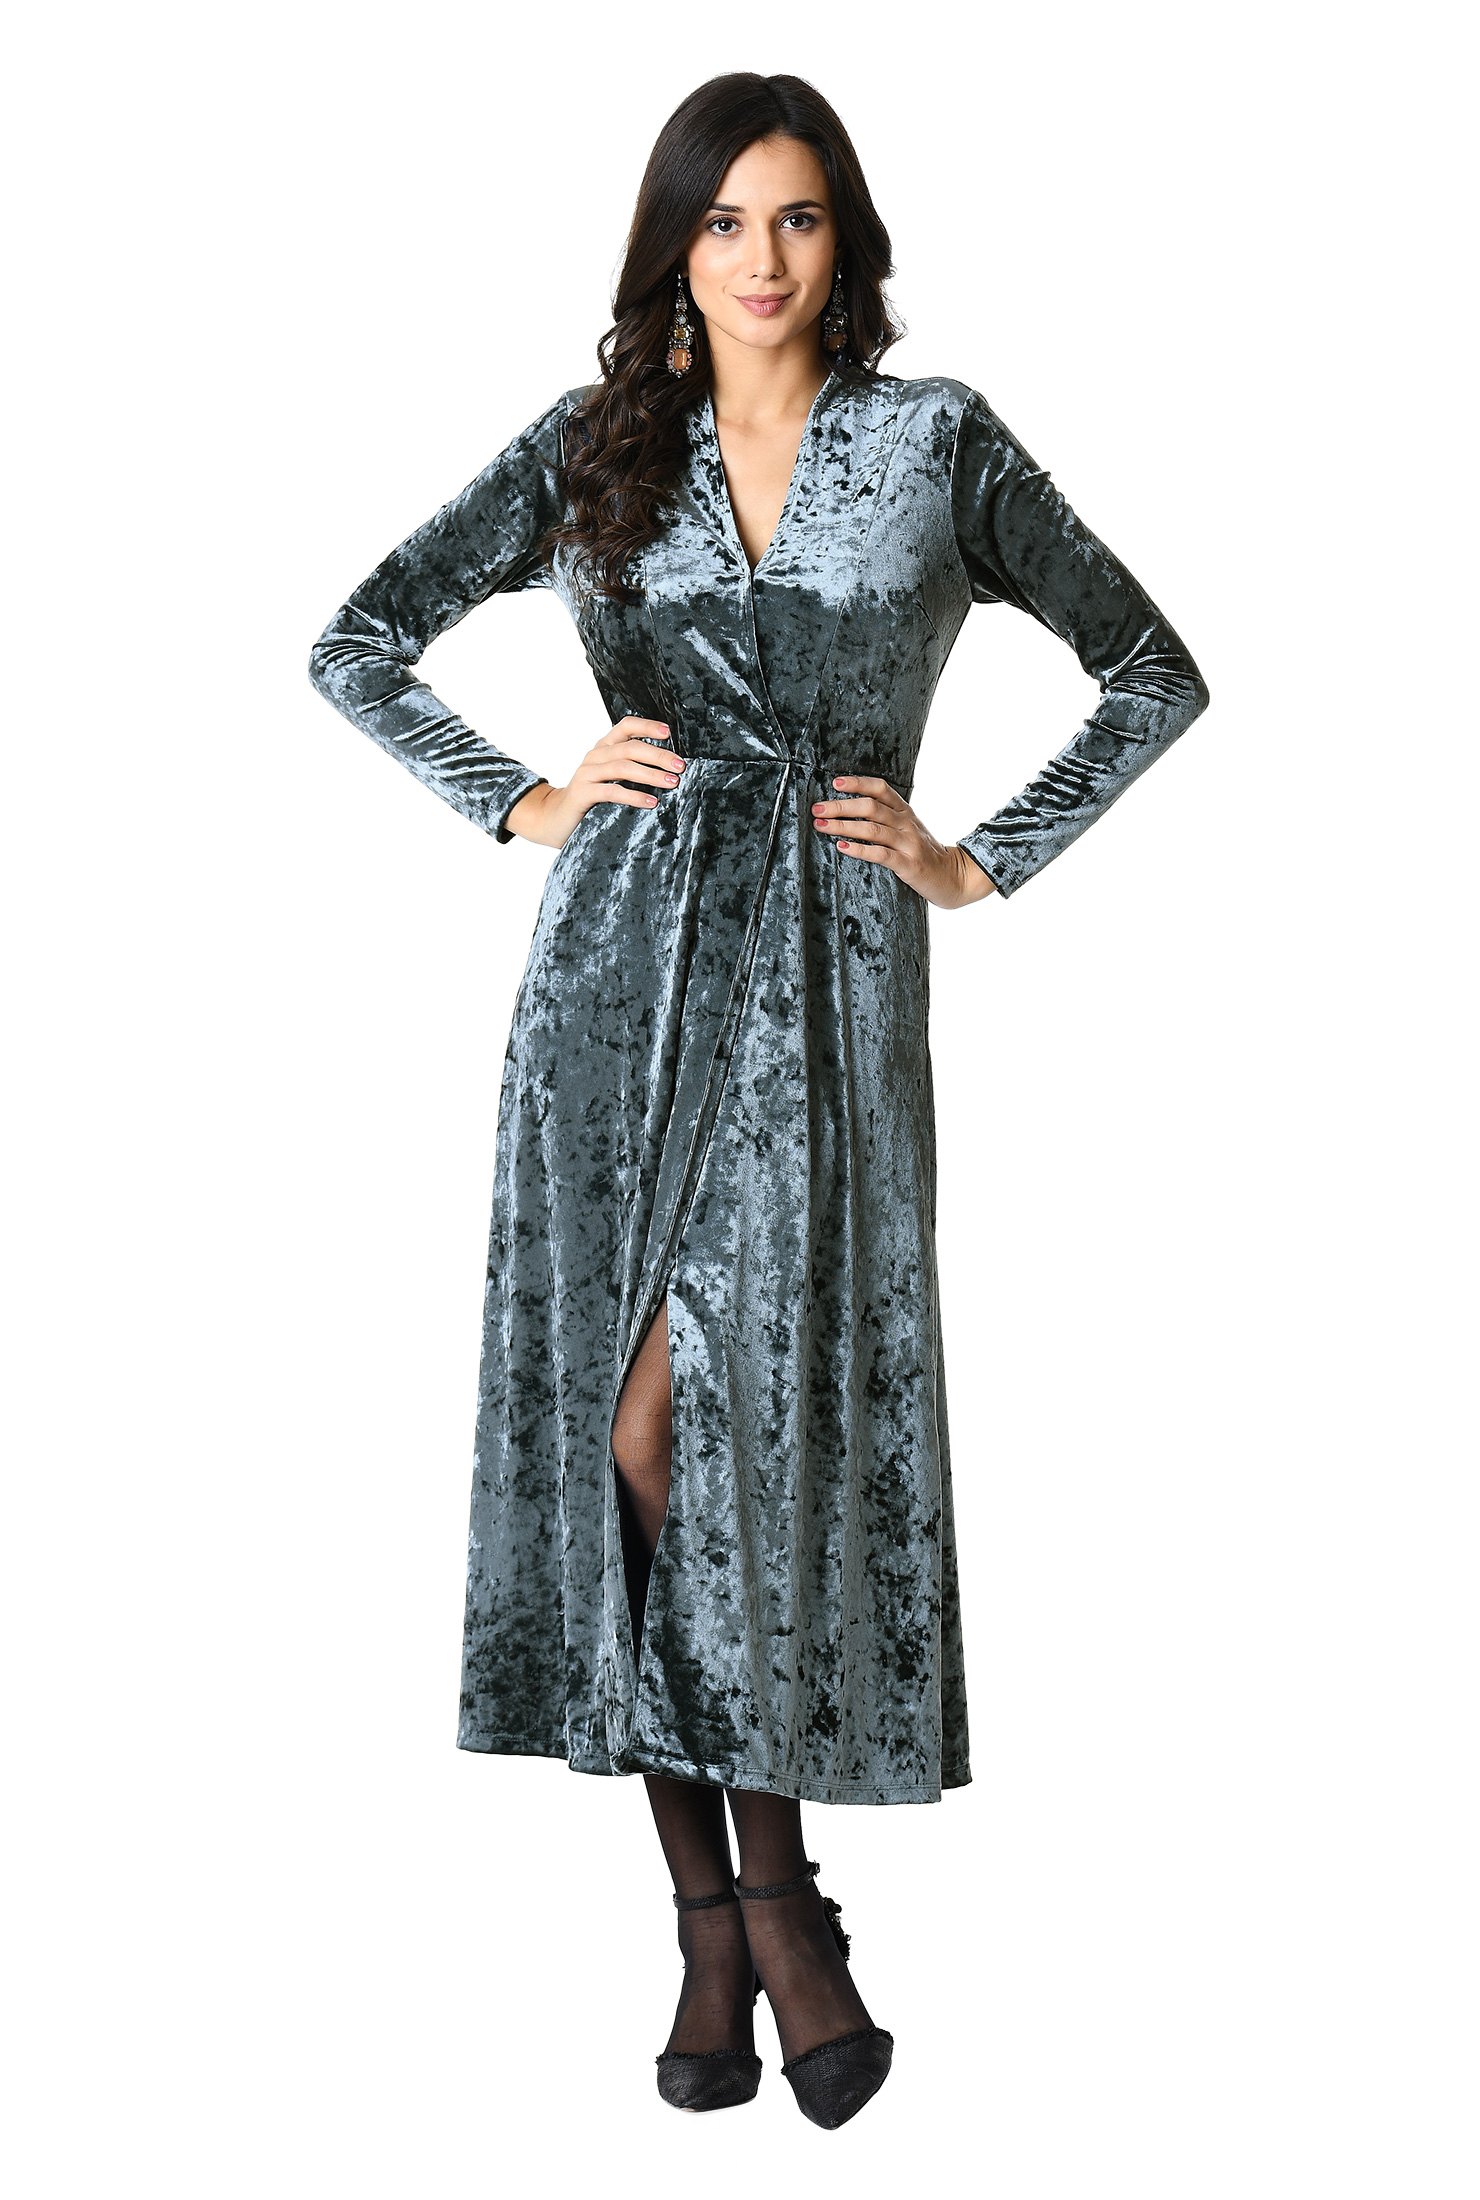 cec830456aa32 Women s Fashion Clothing 0-36W and Custom